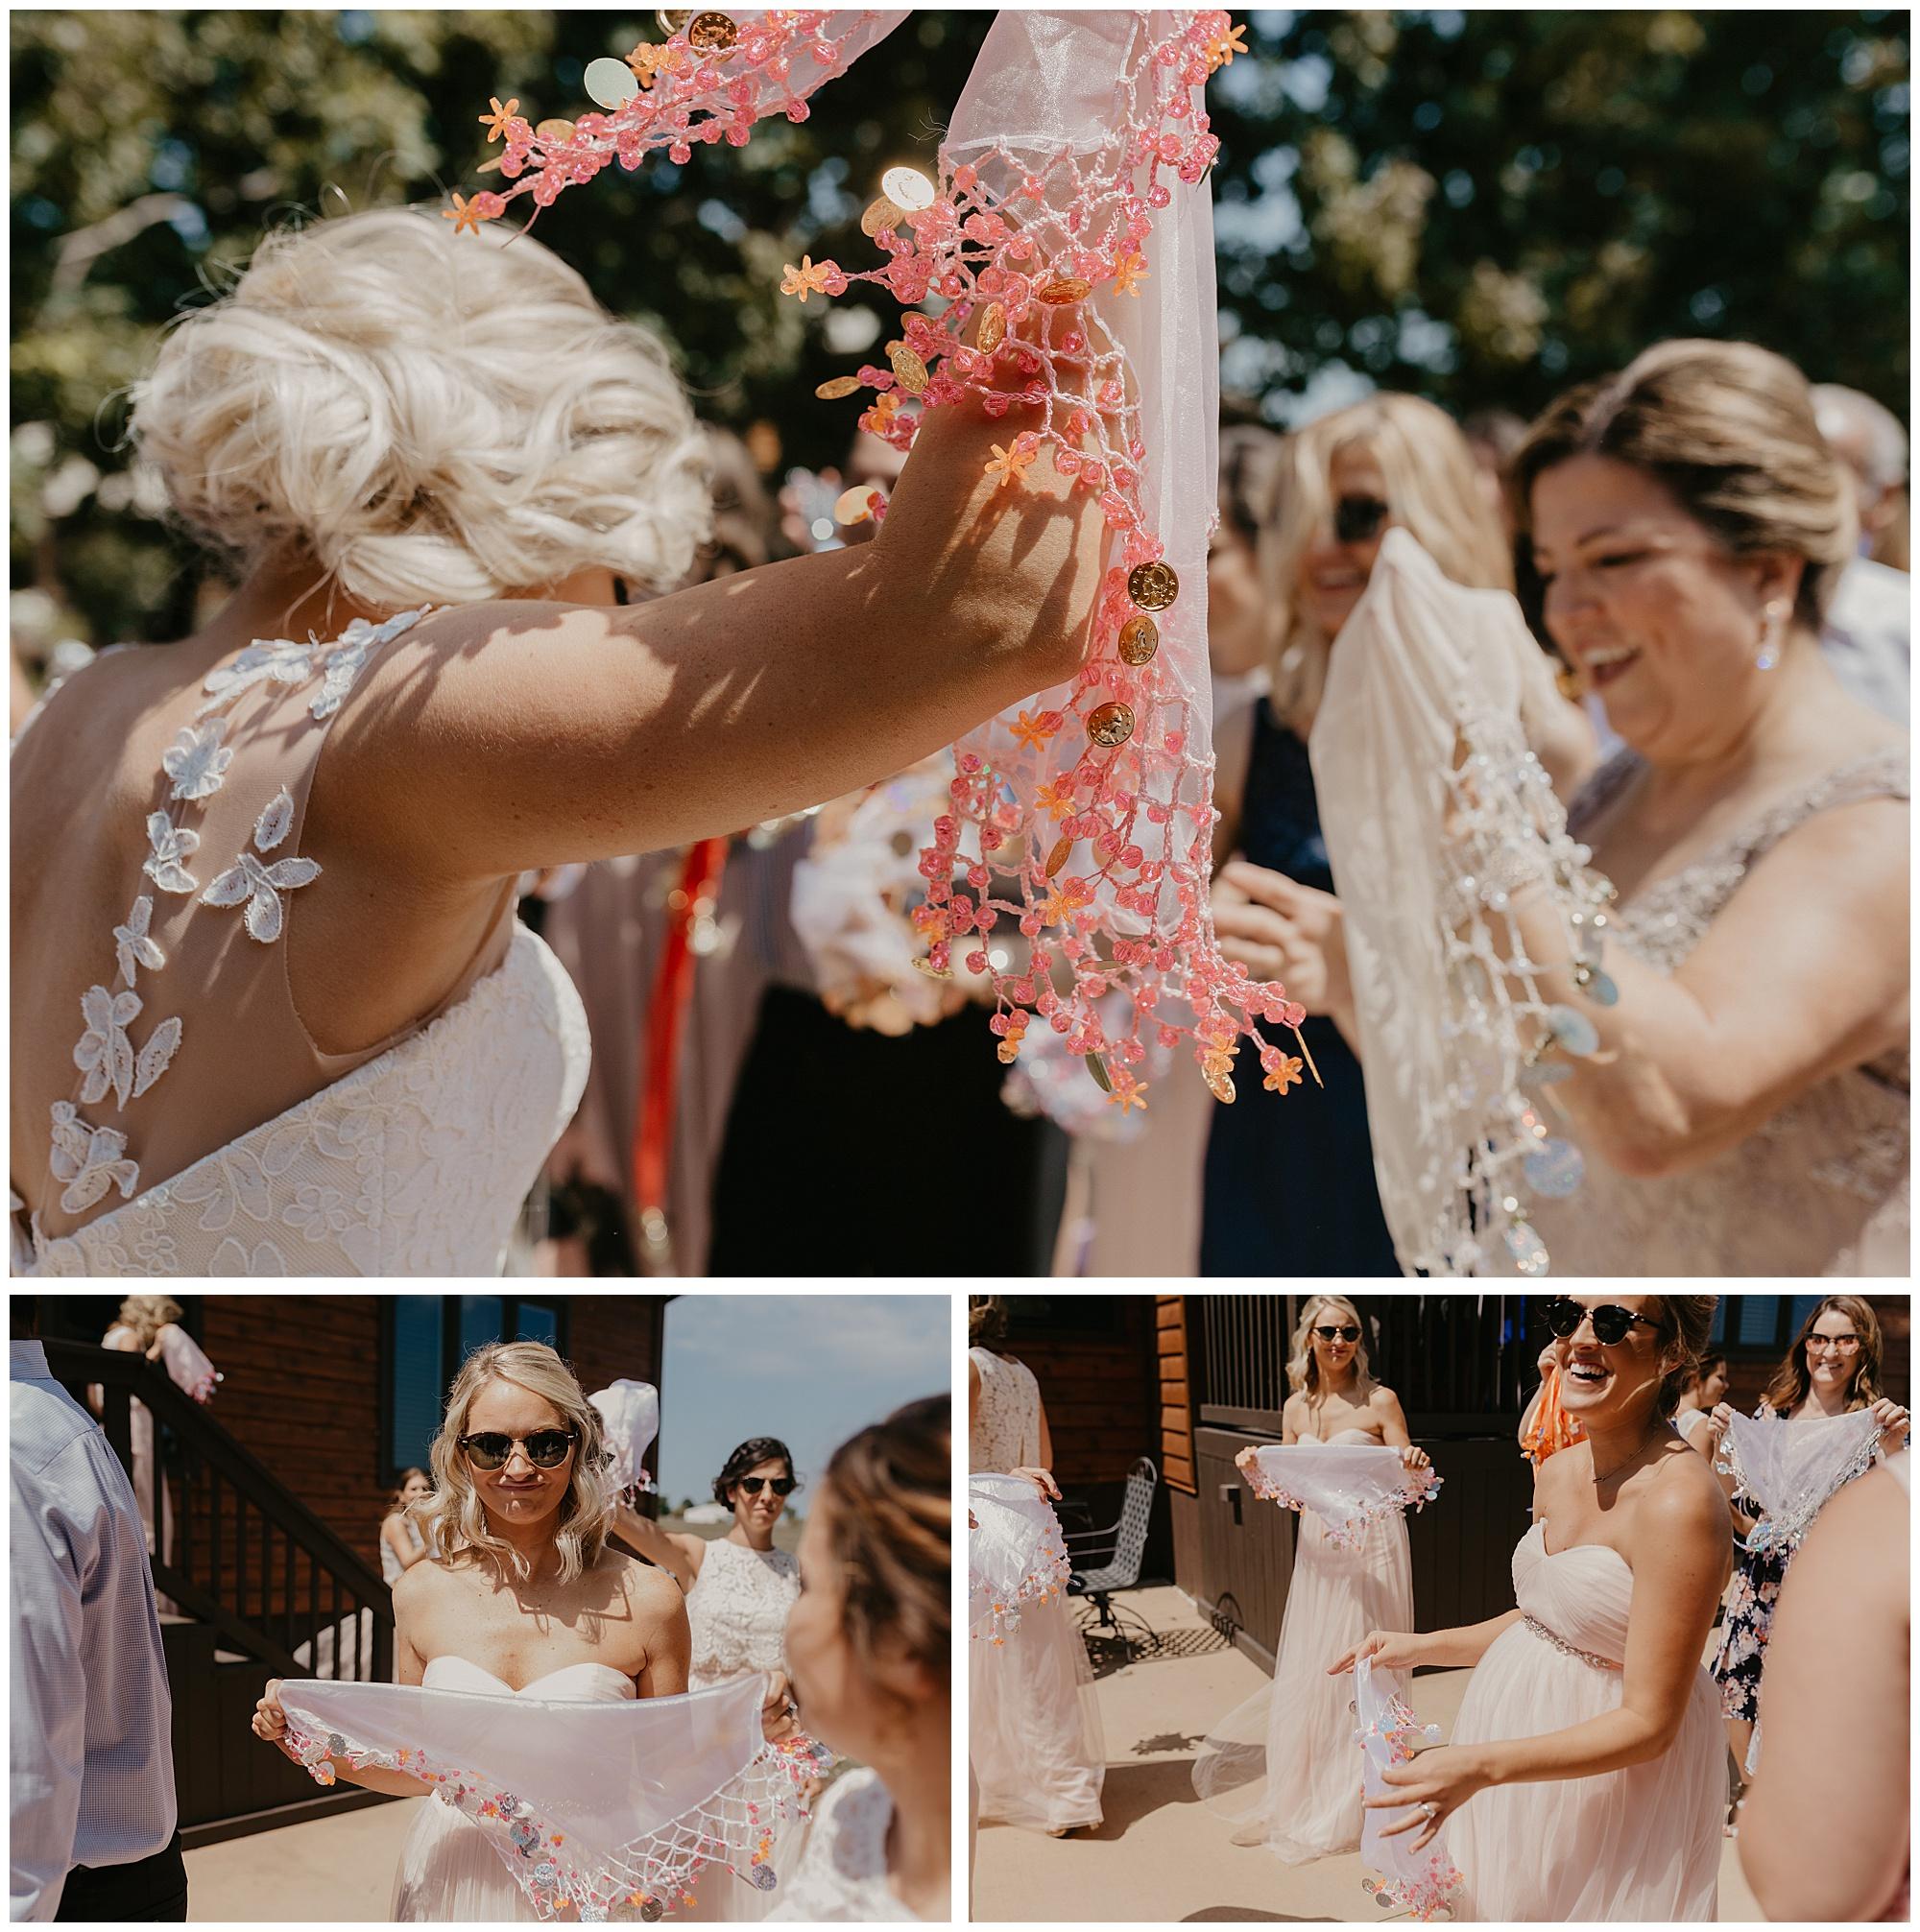 pear_tree_estate_wedding_champaign_il_wright_photographs_jj_0032.jpg